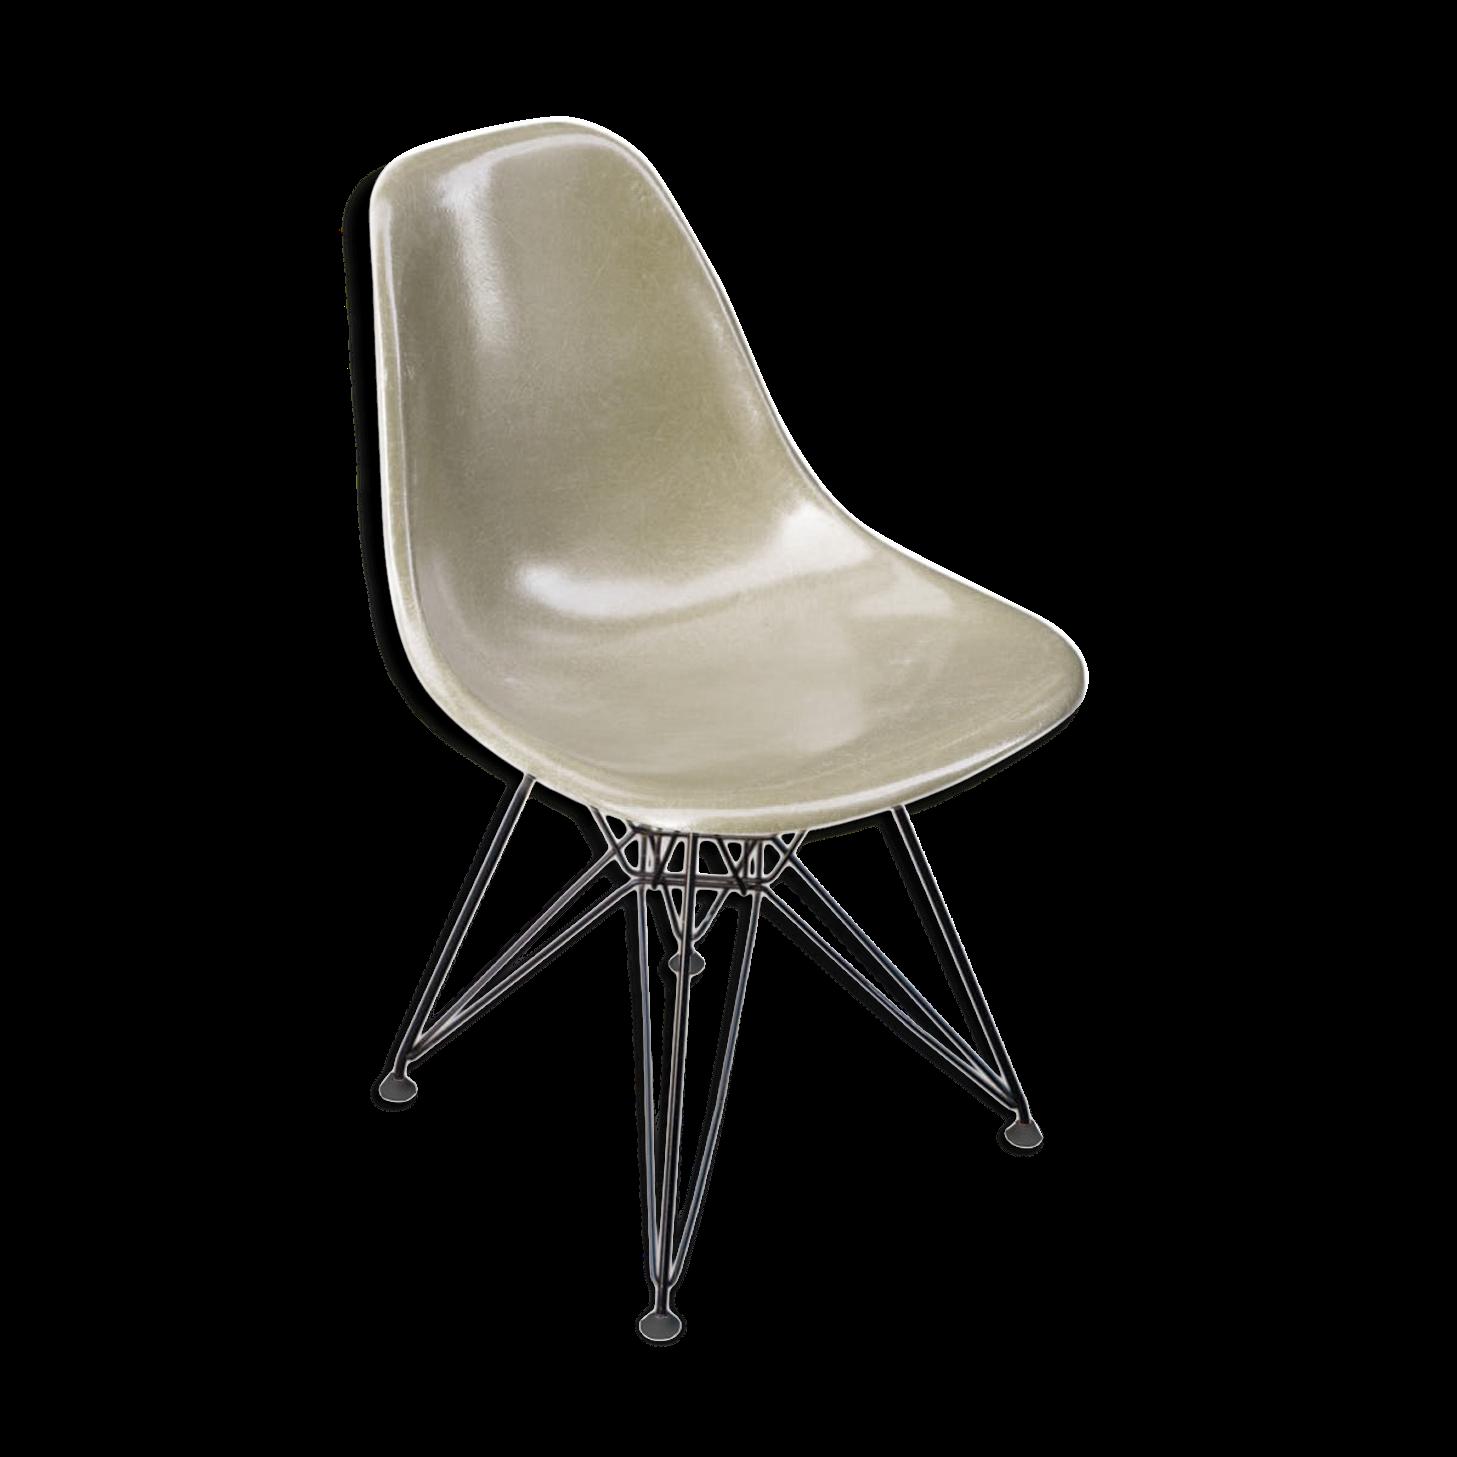 fauteuil eames original. Black Bedroom Furniture Sets. Home Design Ideas